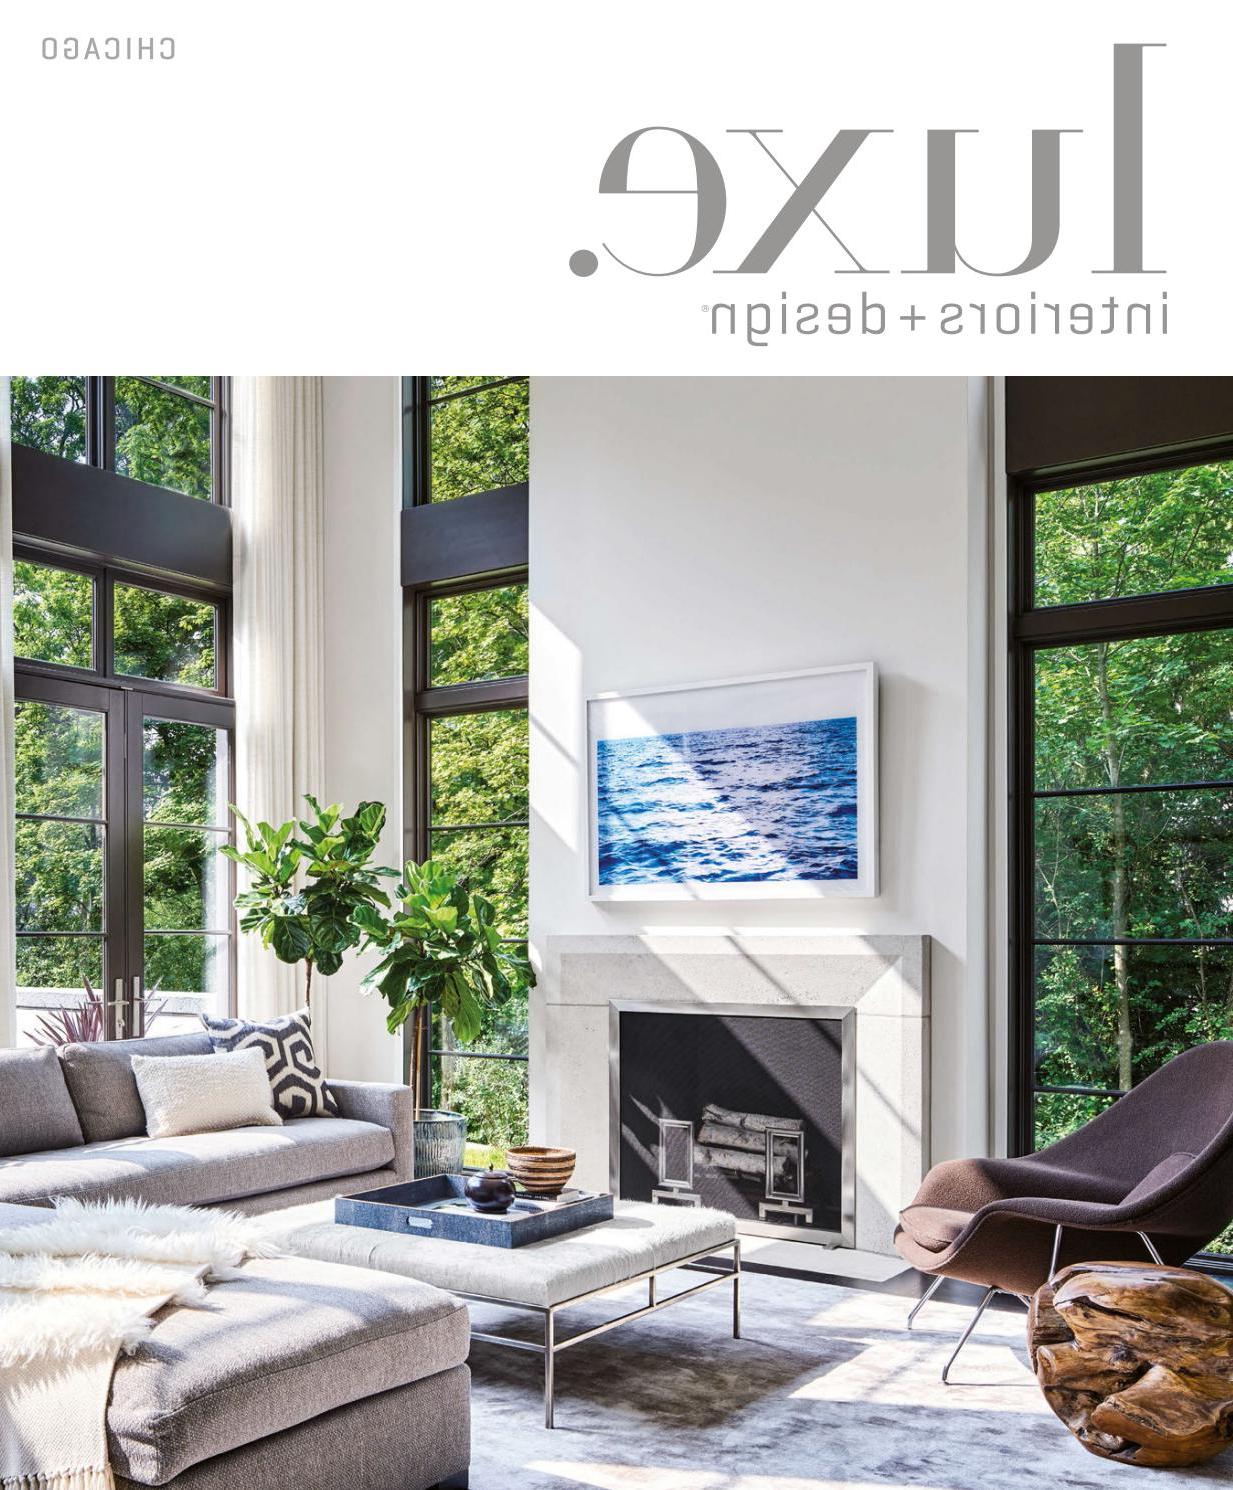 Luxe Magazine March 2017 Chicagosandow® – Issuu Regarding Kilian Black 74 Inch Tv Stands (View 19 of 20)